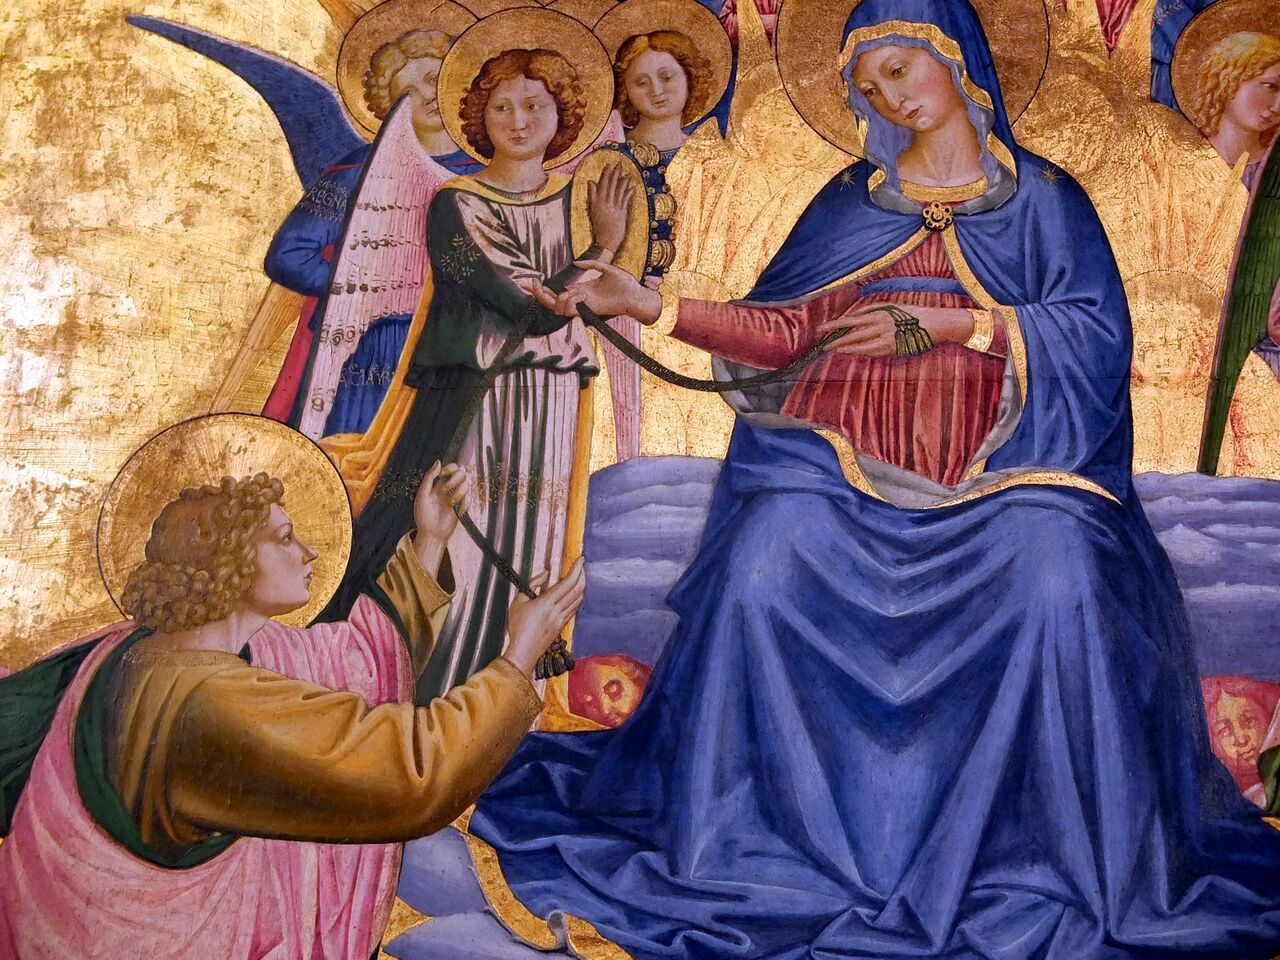 Montefalco. 17mila visitatori per la Madonna della Cintola